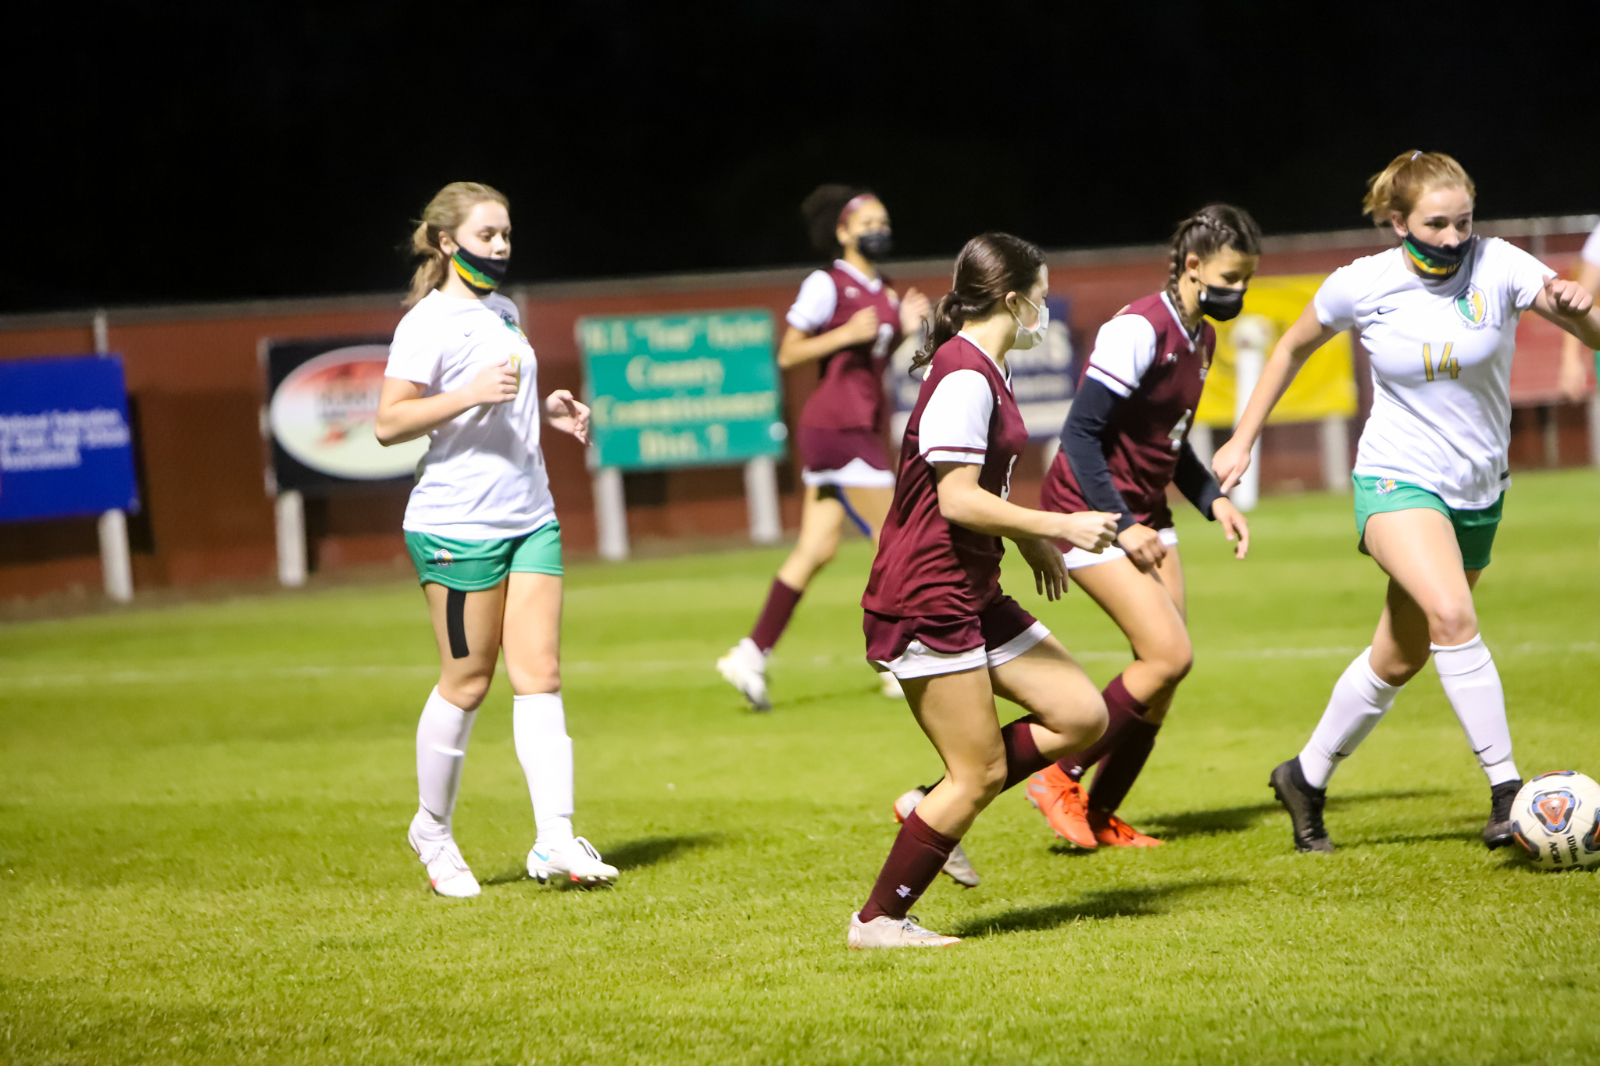 Lady Pirates Varsity Soccer vs Richmond 3/29 Photos (Album 2 of 2)